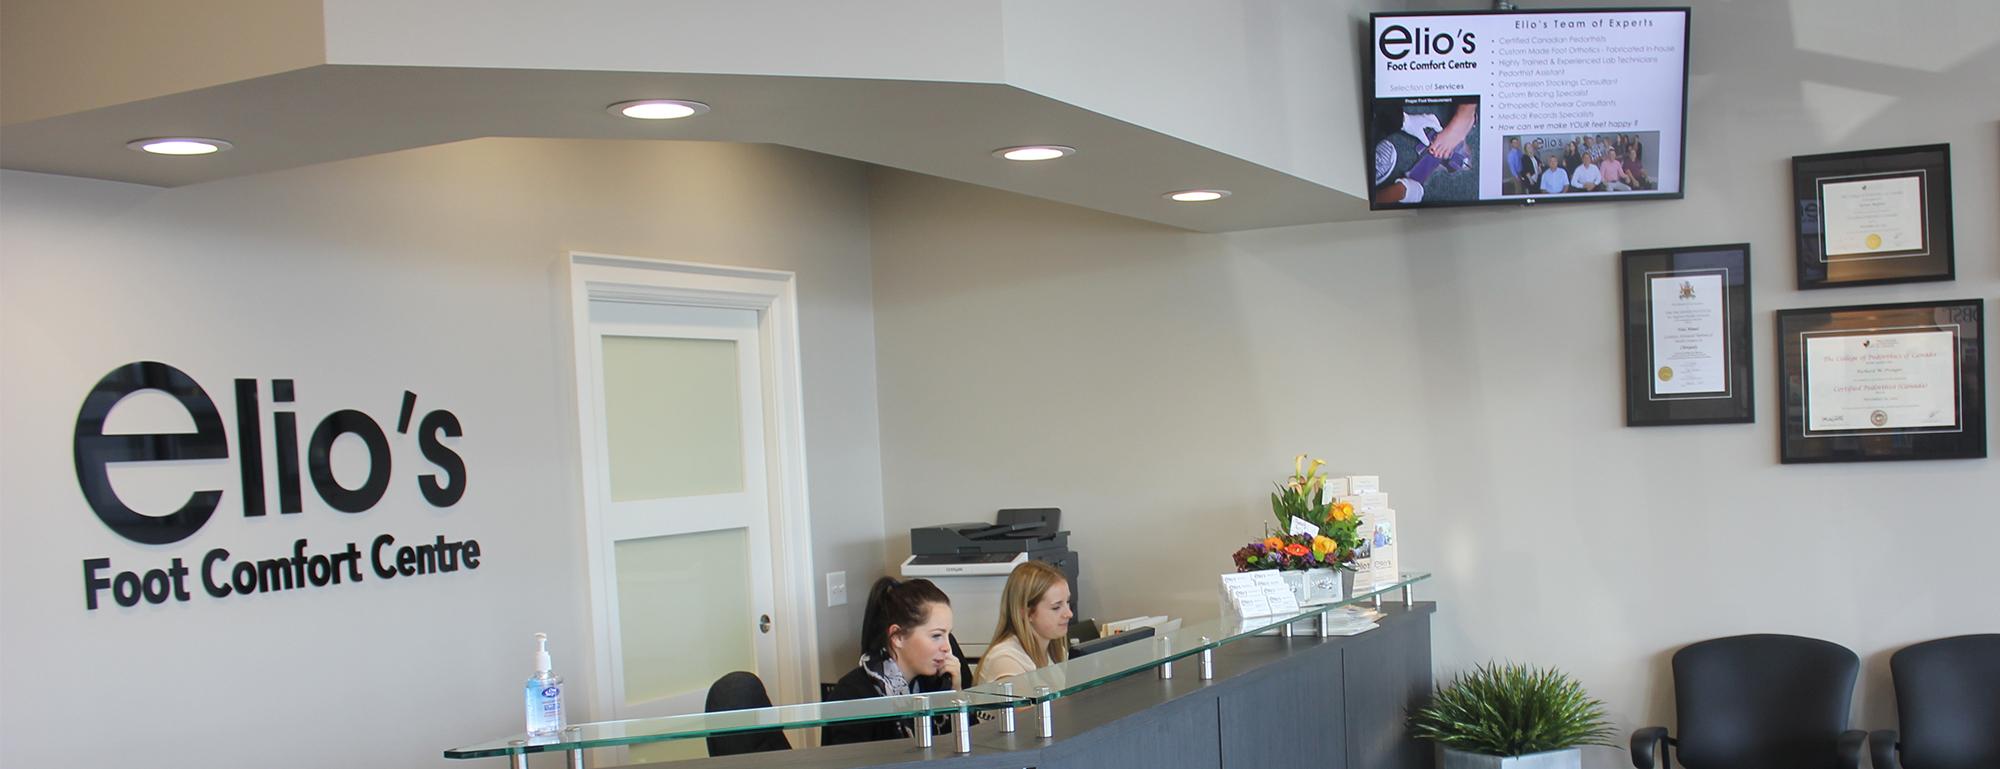 Foot Pain Solution Niagara | Elio's Foot Comfort Centre reception